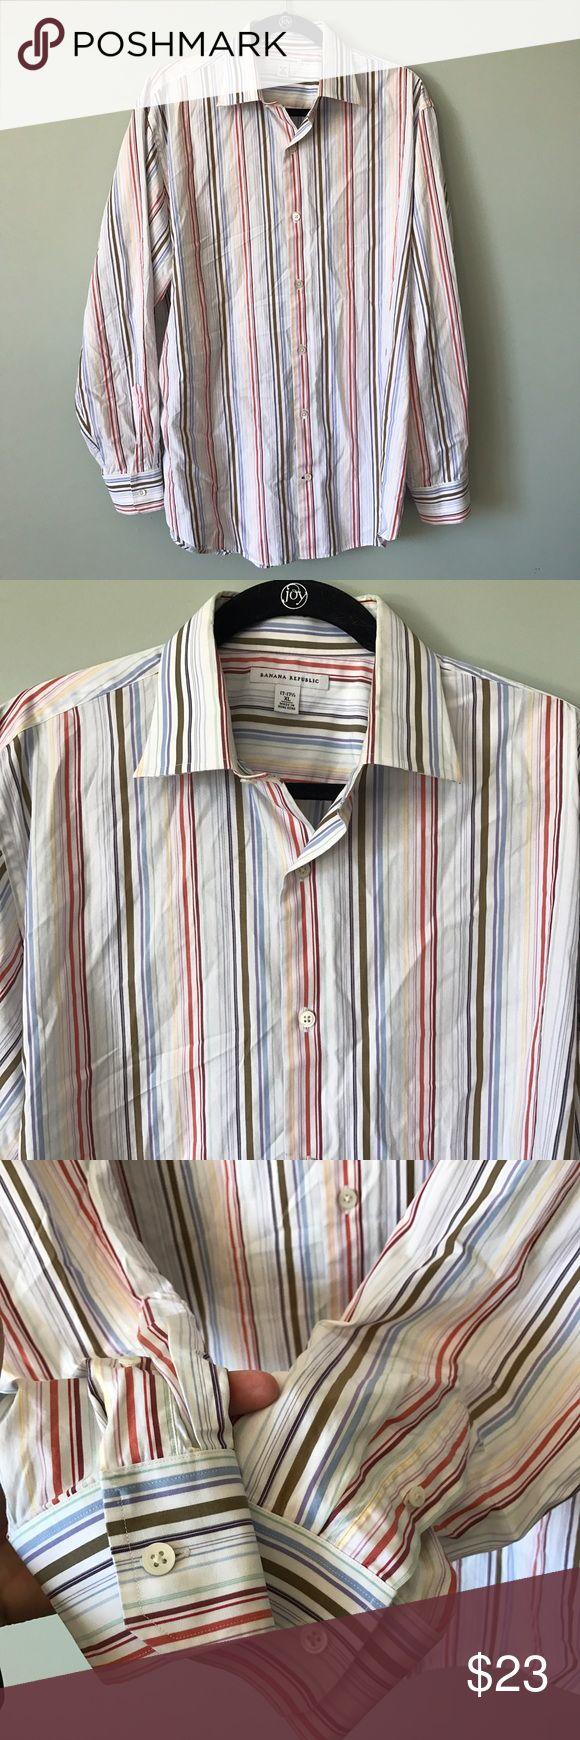 0a089b9cc Banana Republic Button Down Shirt size 17 - 17 1/2